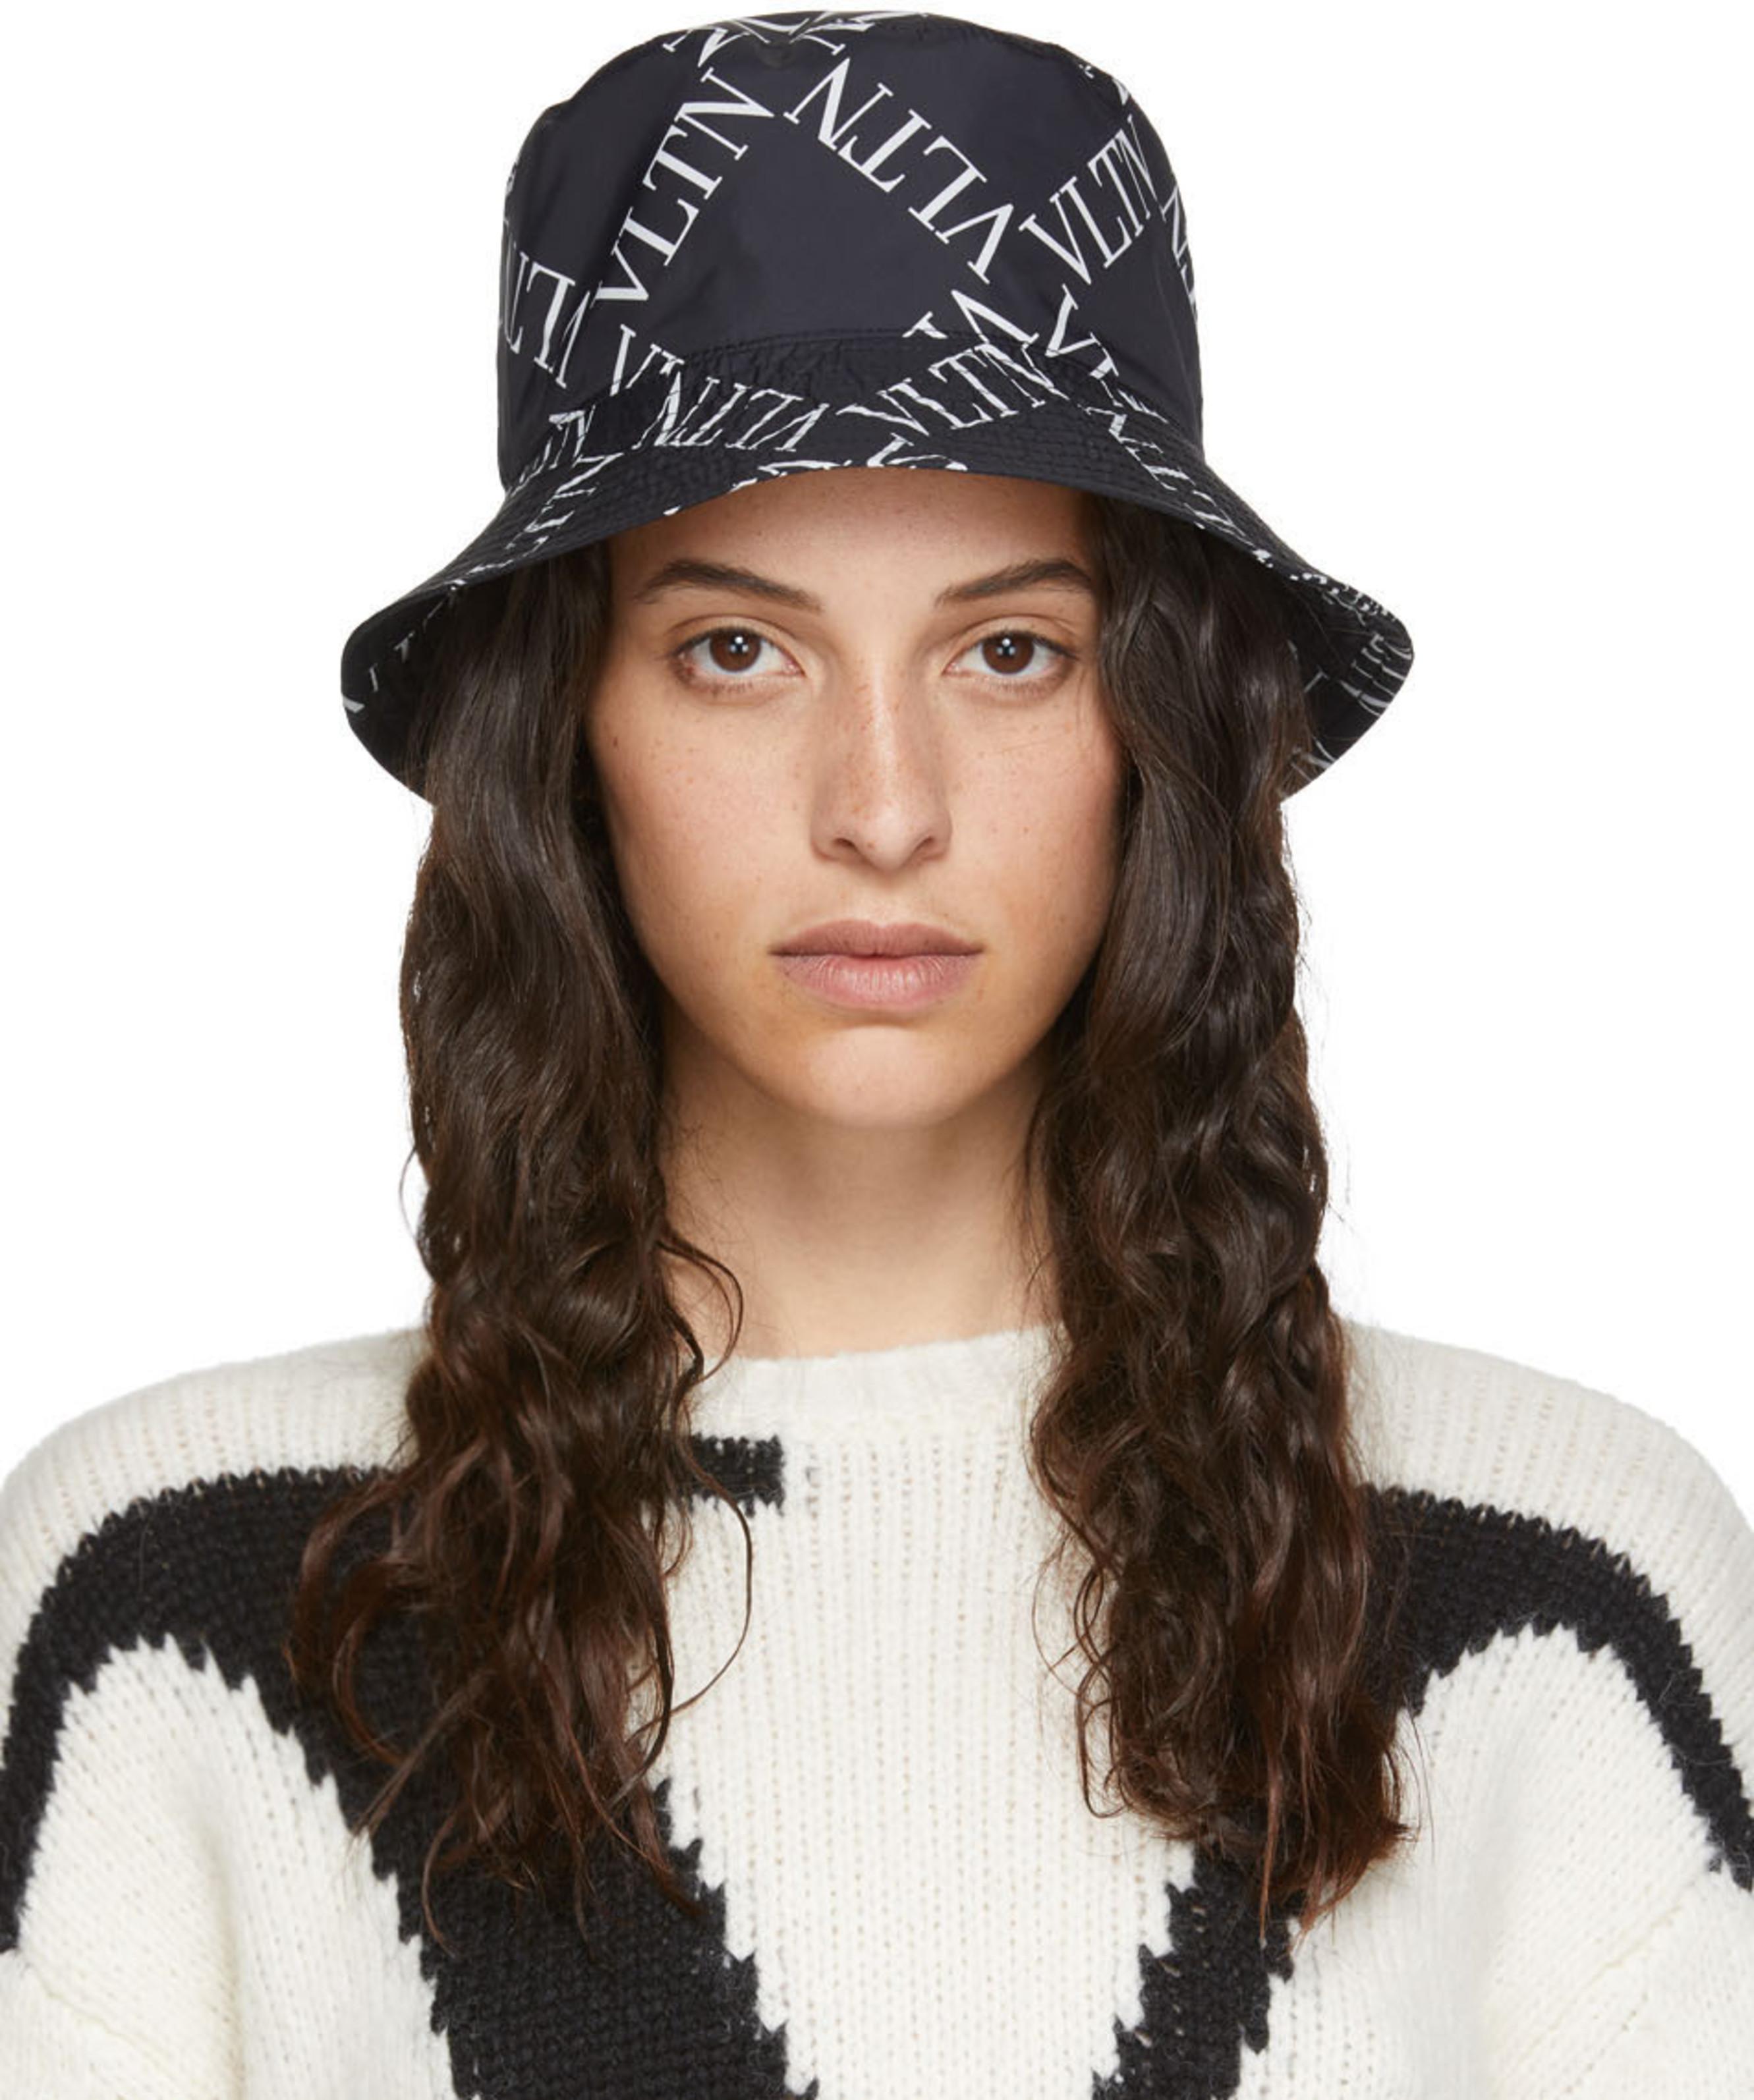 Black & White Valentino Garavani 'VLTN' Bucket Hat